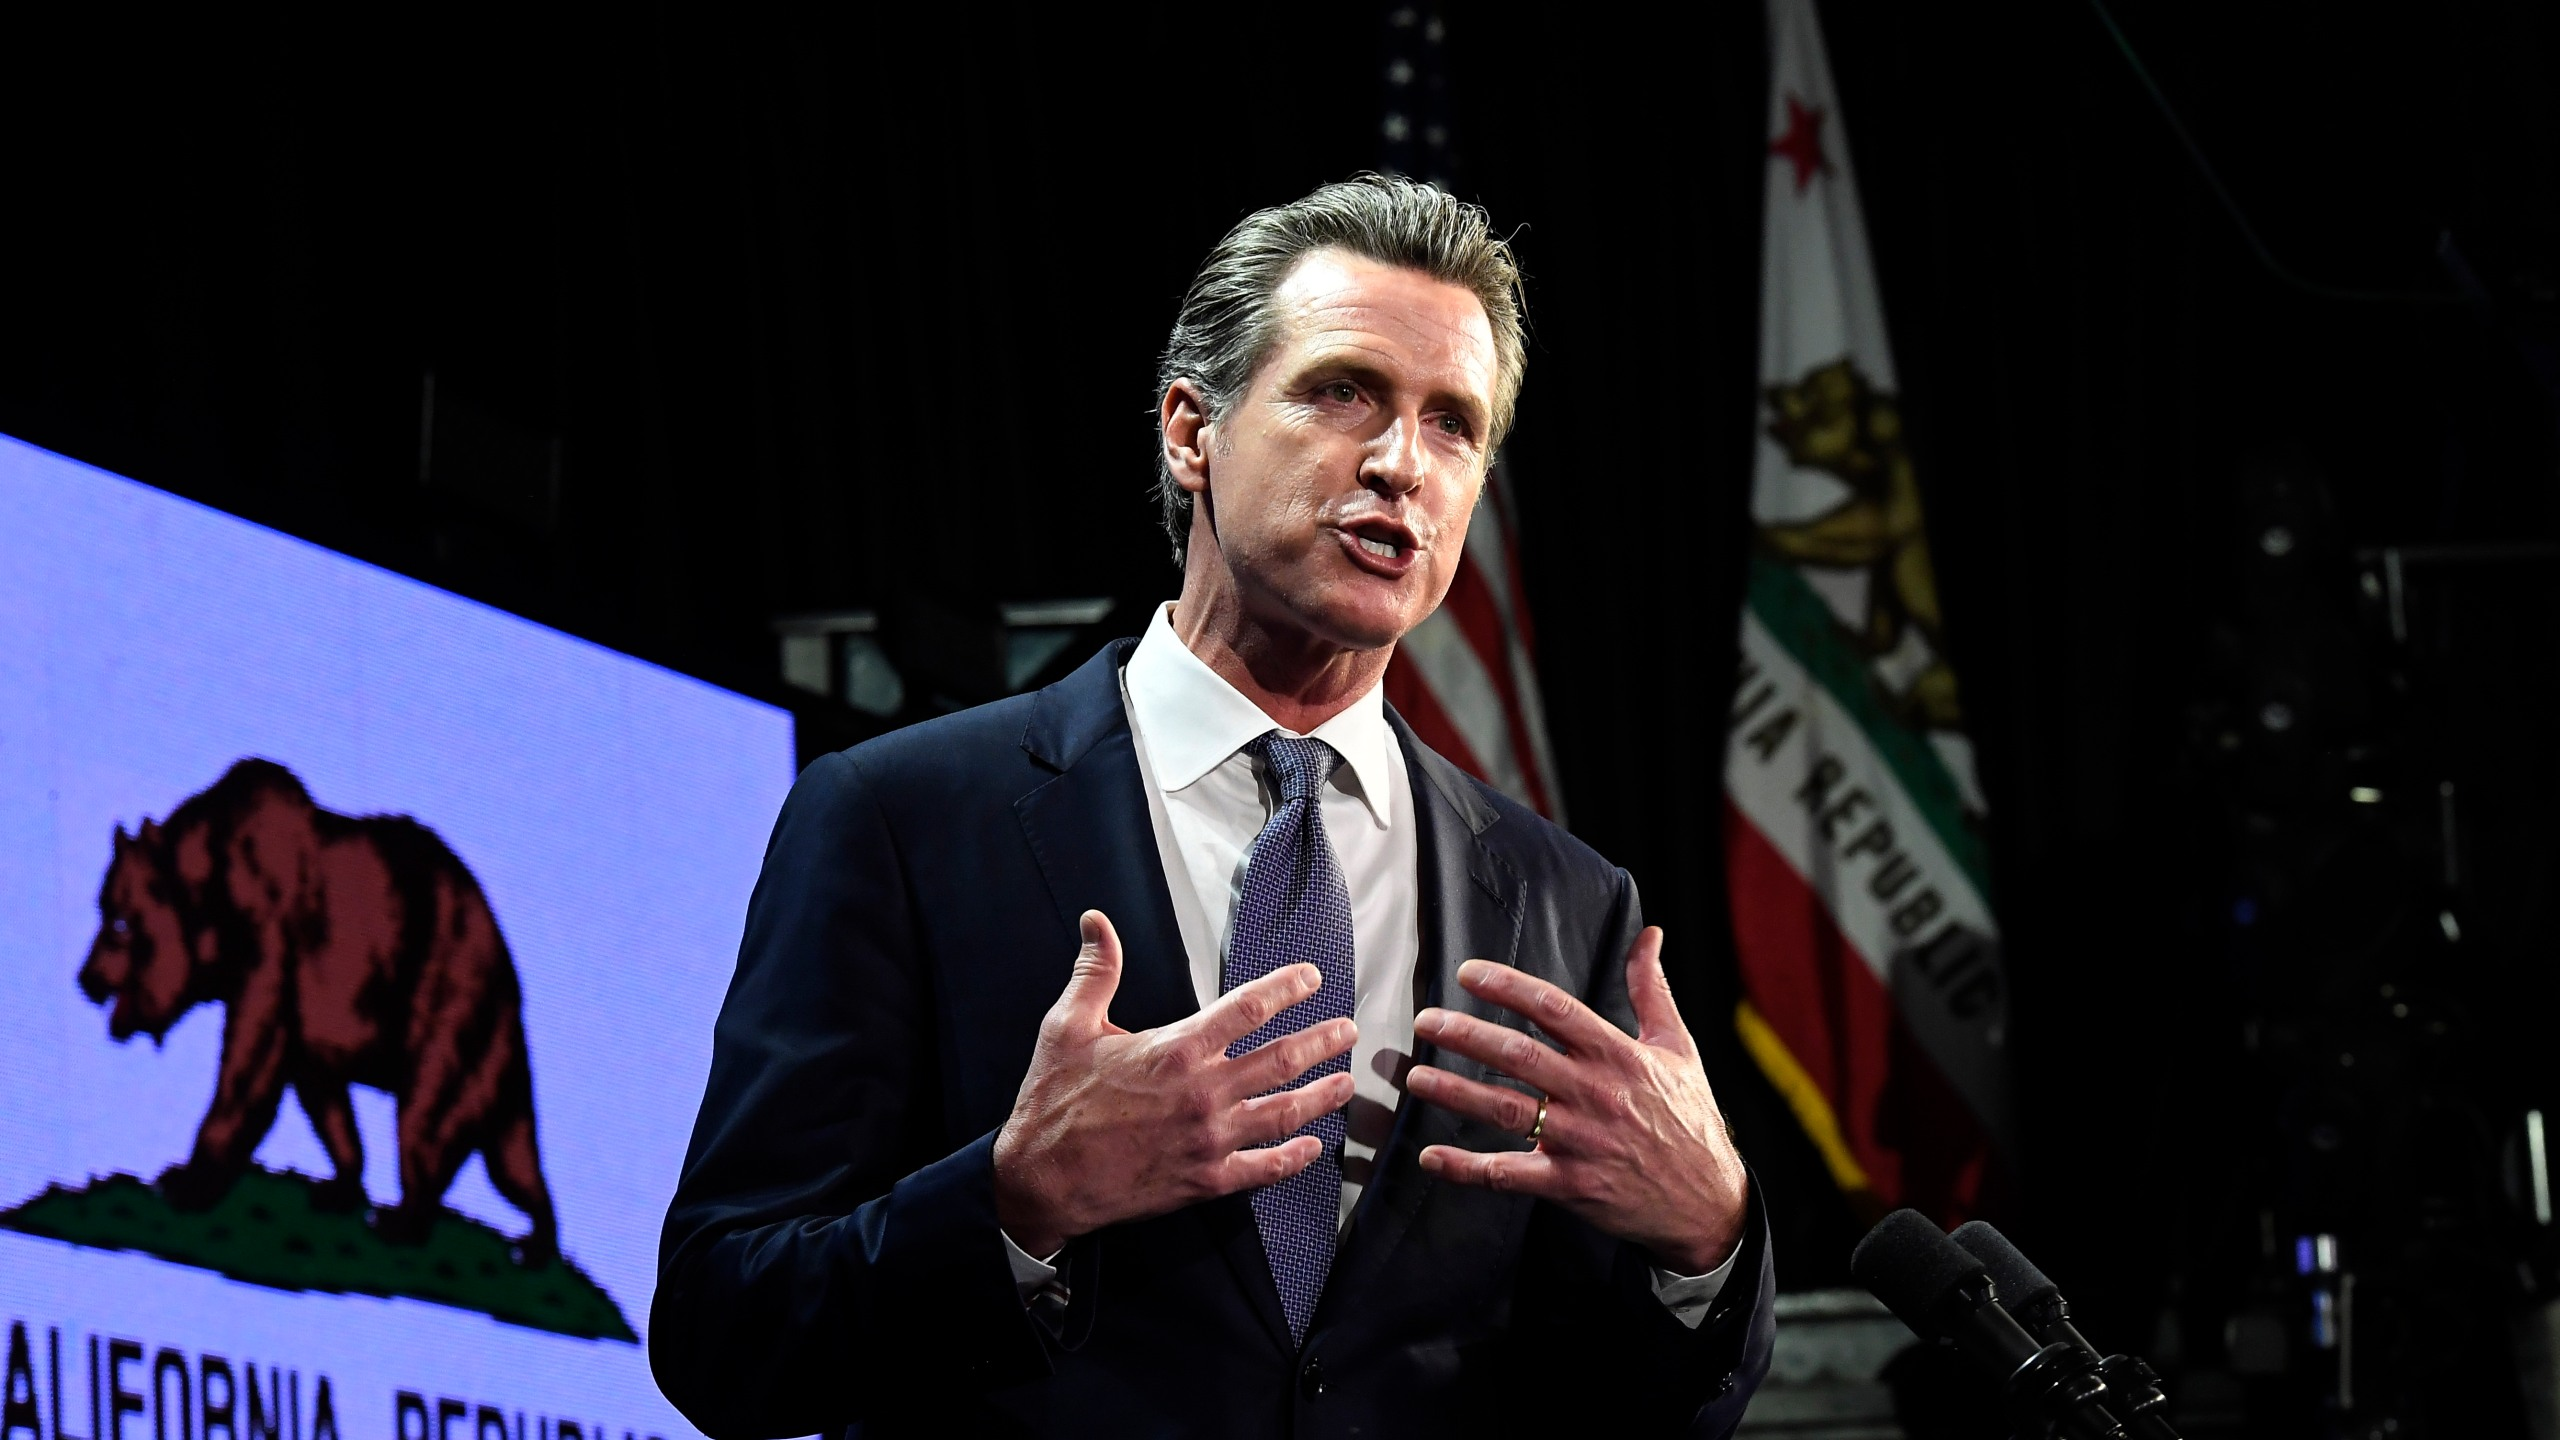 Gavin Newsom speaks during an election night event on Nov. 6, 2018, in Los Angeles. (Credit: Kevork Djansezian/Getty Images)